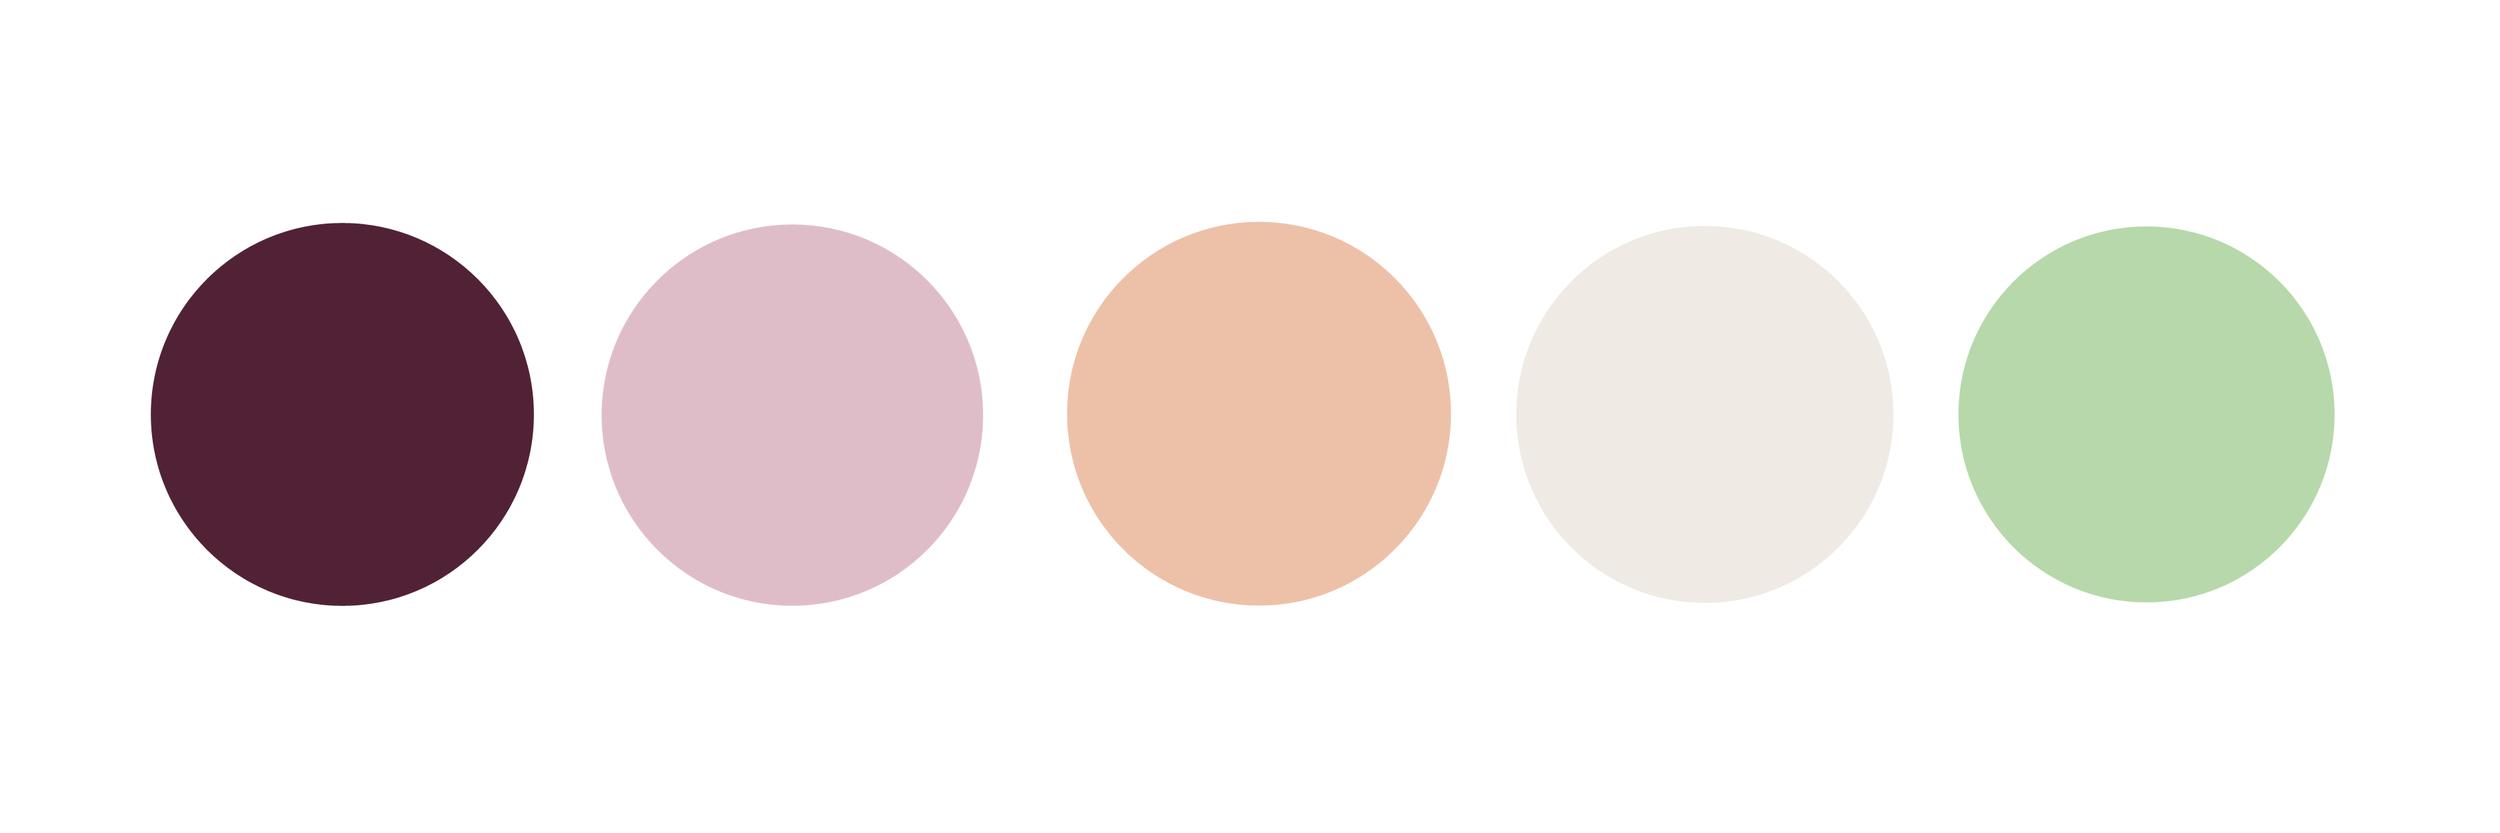 colourpalette-tarajordan.png